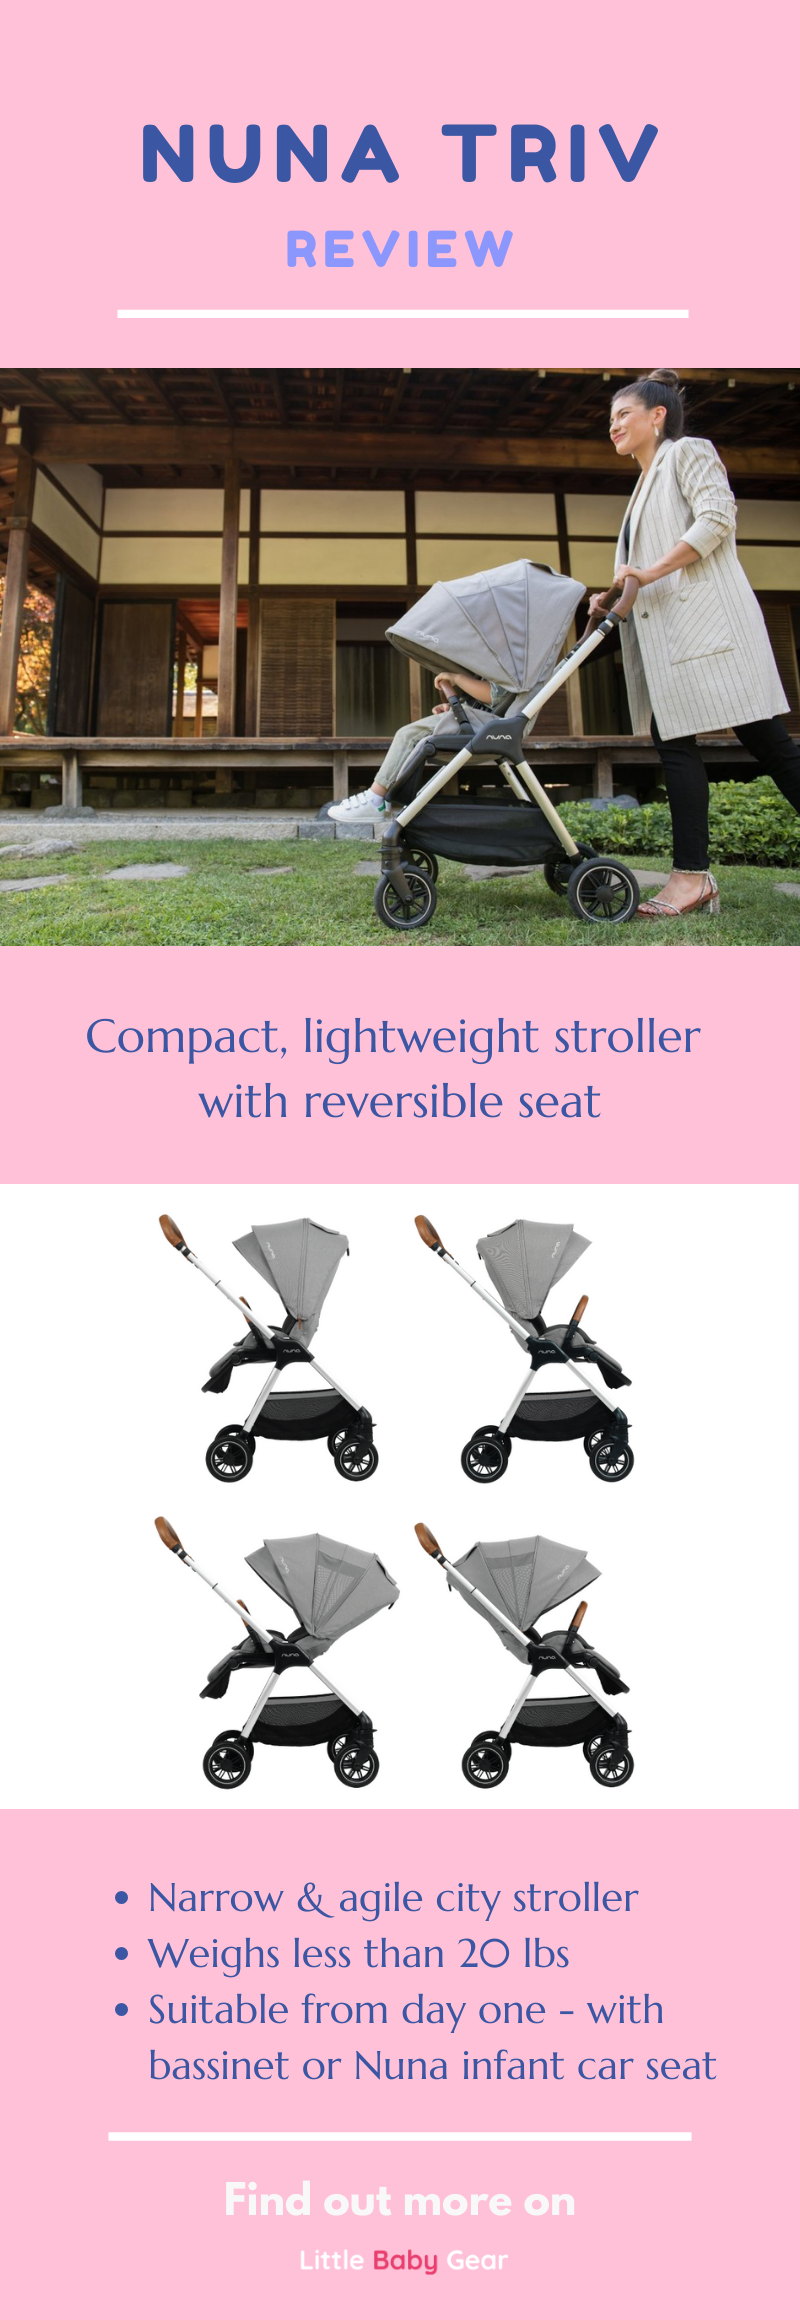 37++ Nuna triv stroller review info